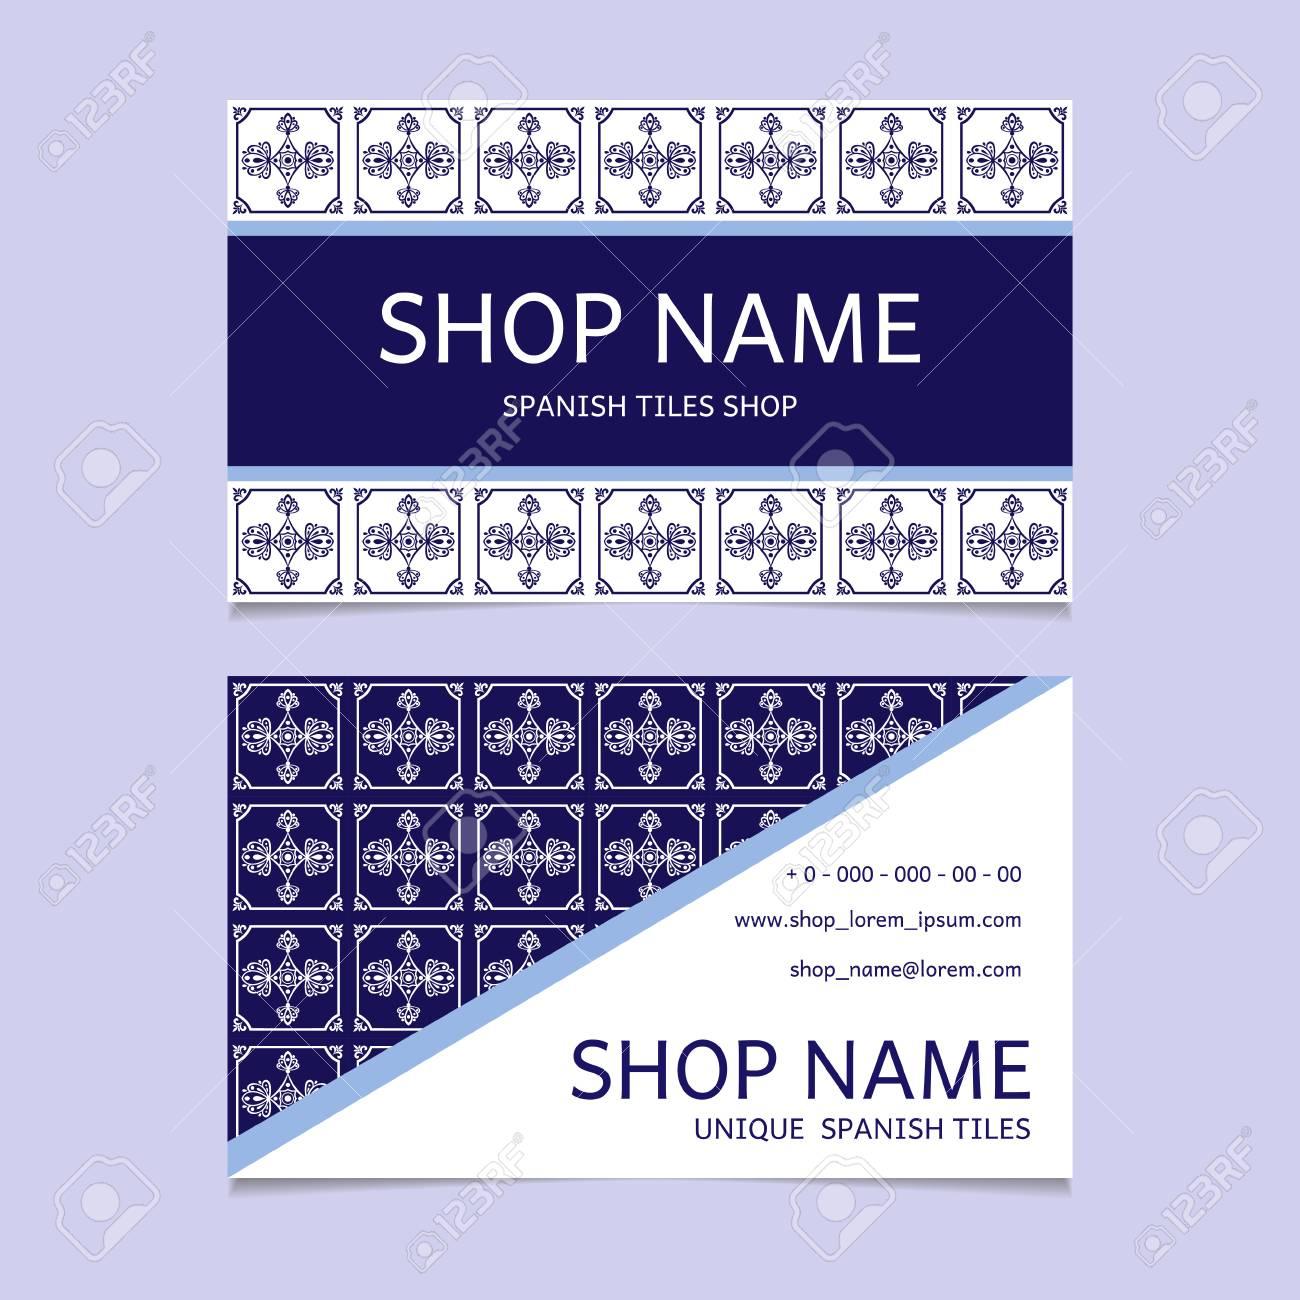 Tiles shop identity template design visiting card with ceramic tiles shop identity template design visiting card with ceramic ornament for spanish majolica store colourmoves